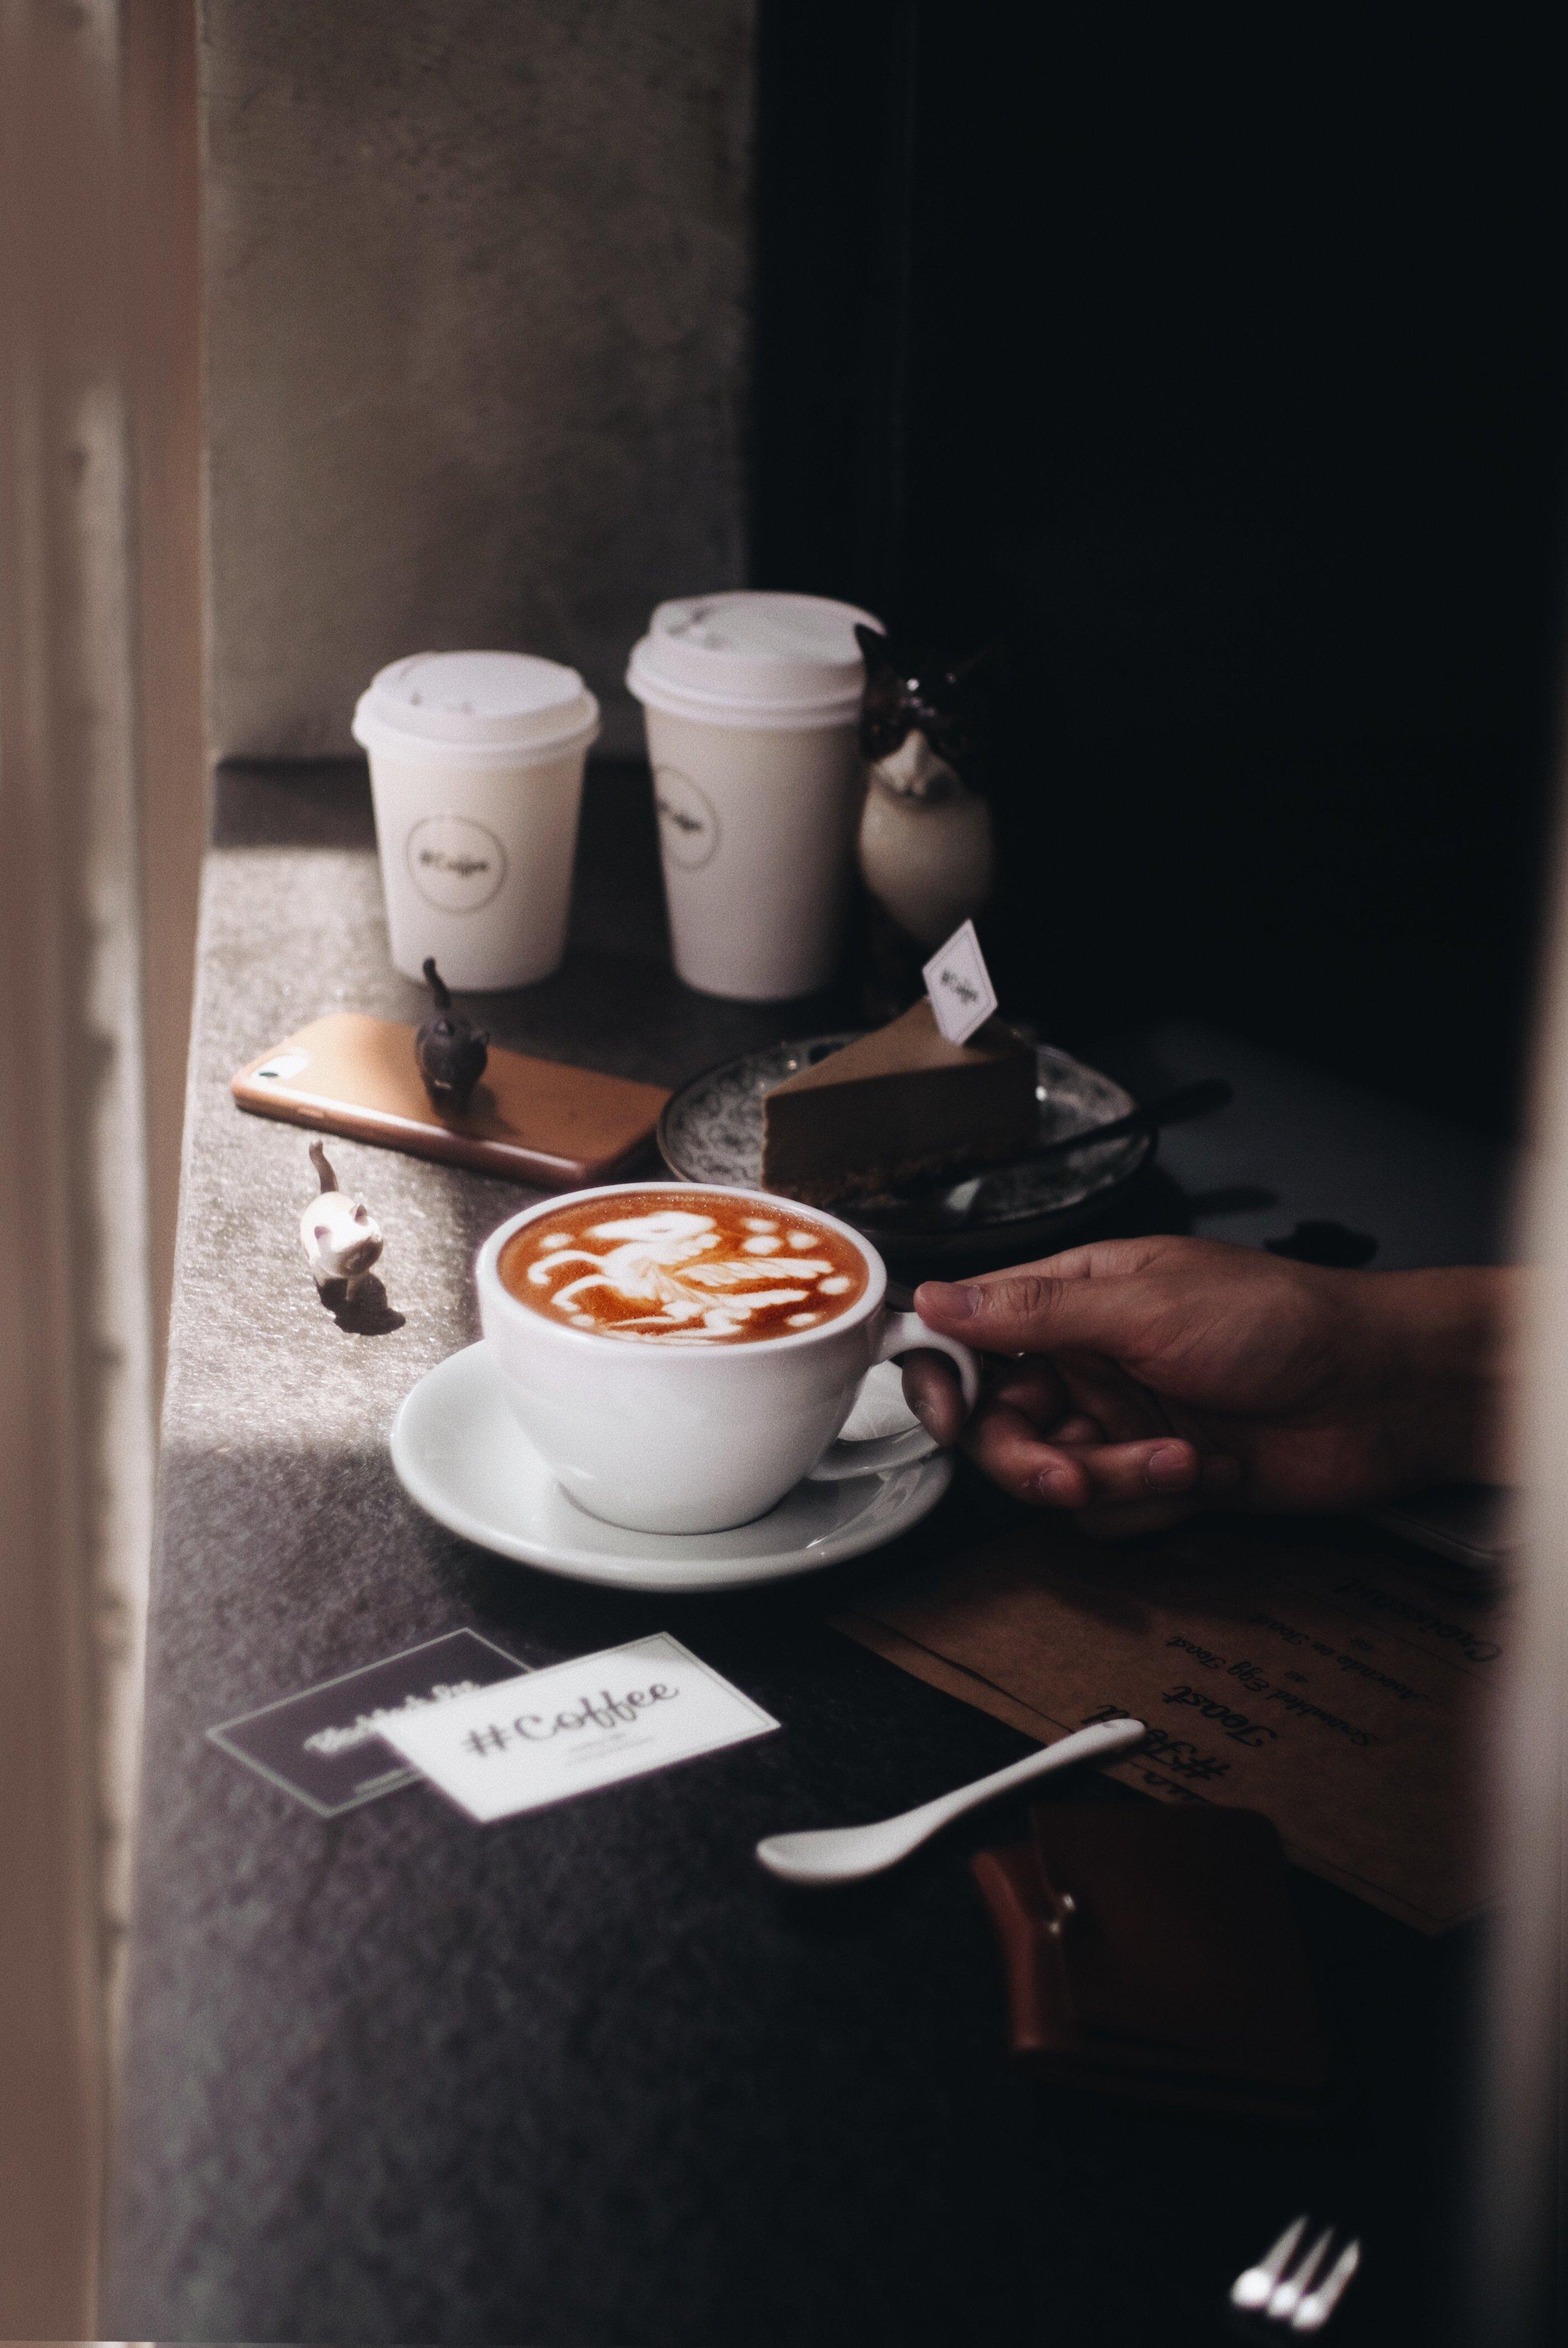 # - HASHTAG COFFEE